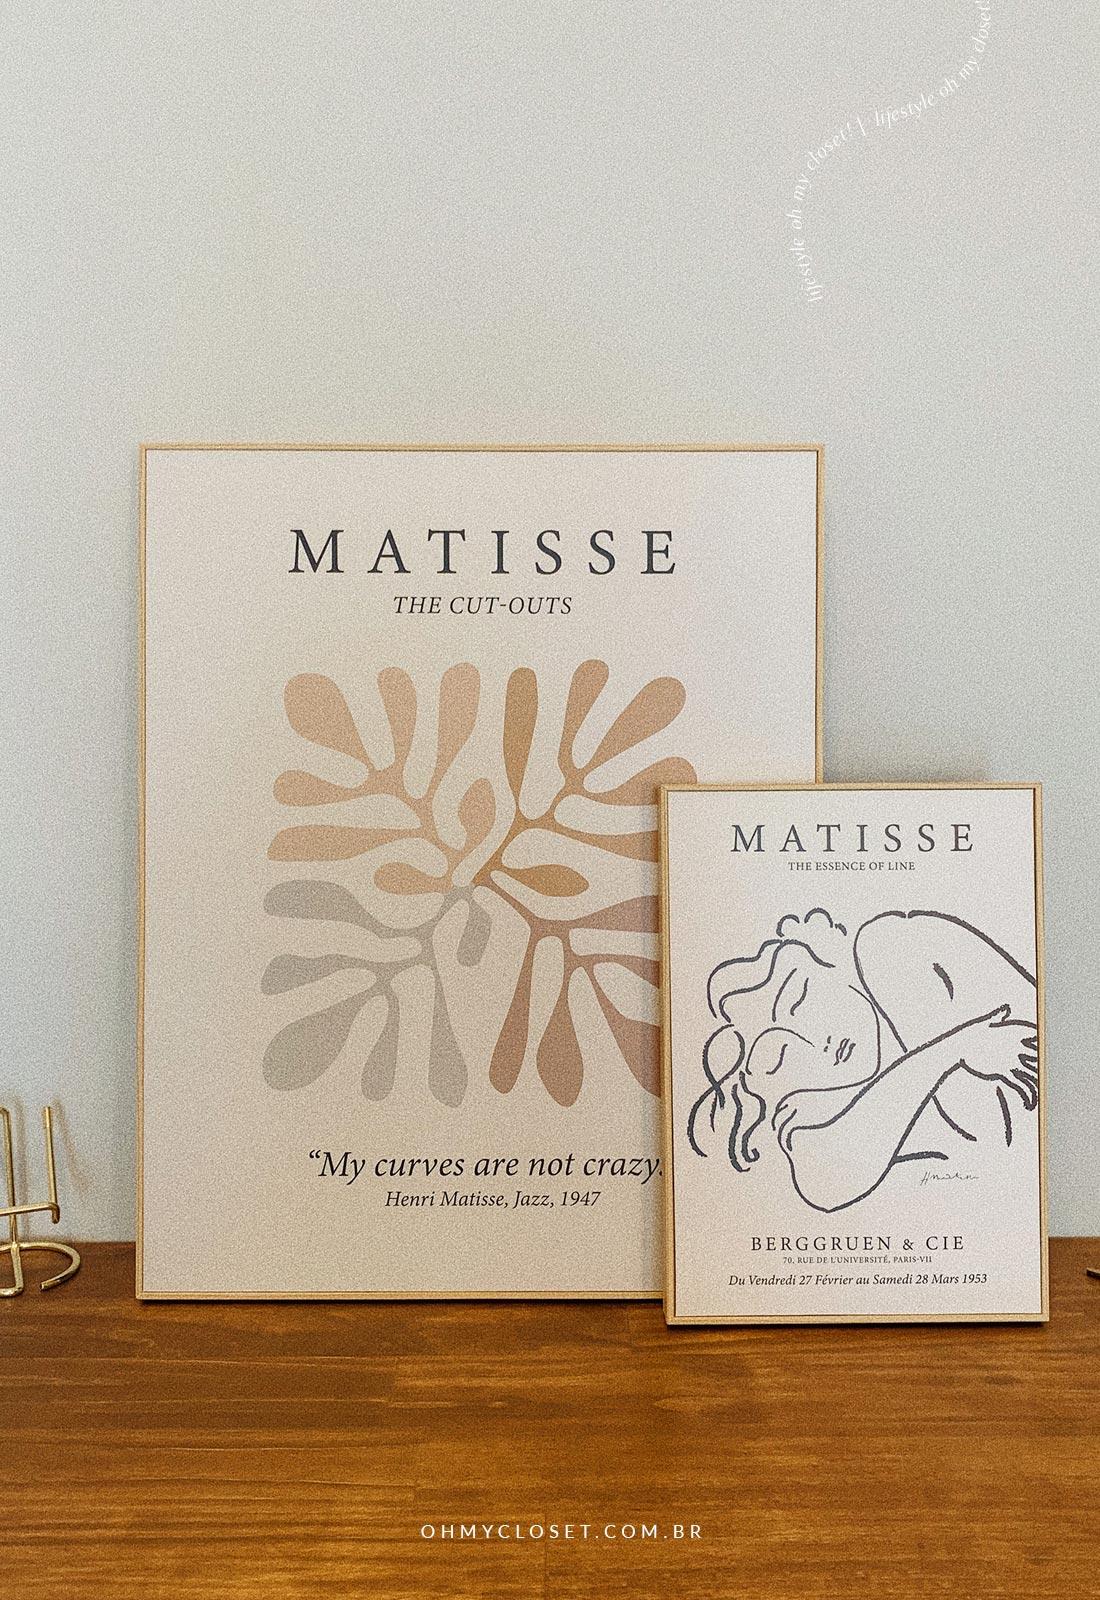 Mais obras de Henri Matisse.